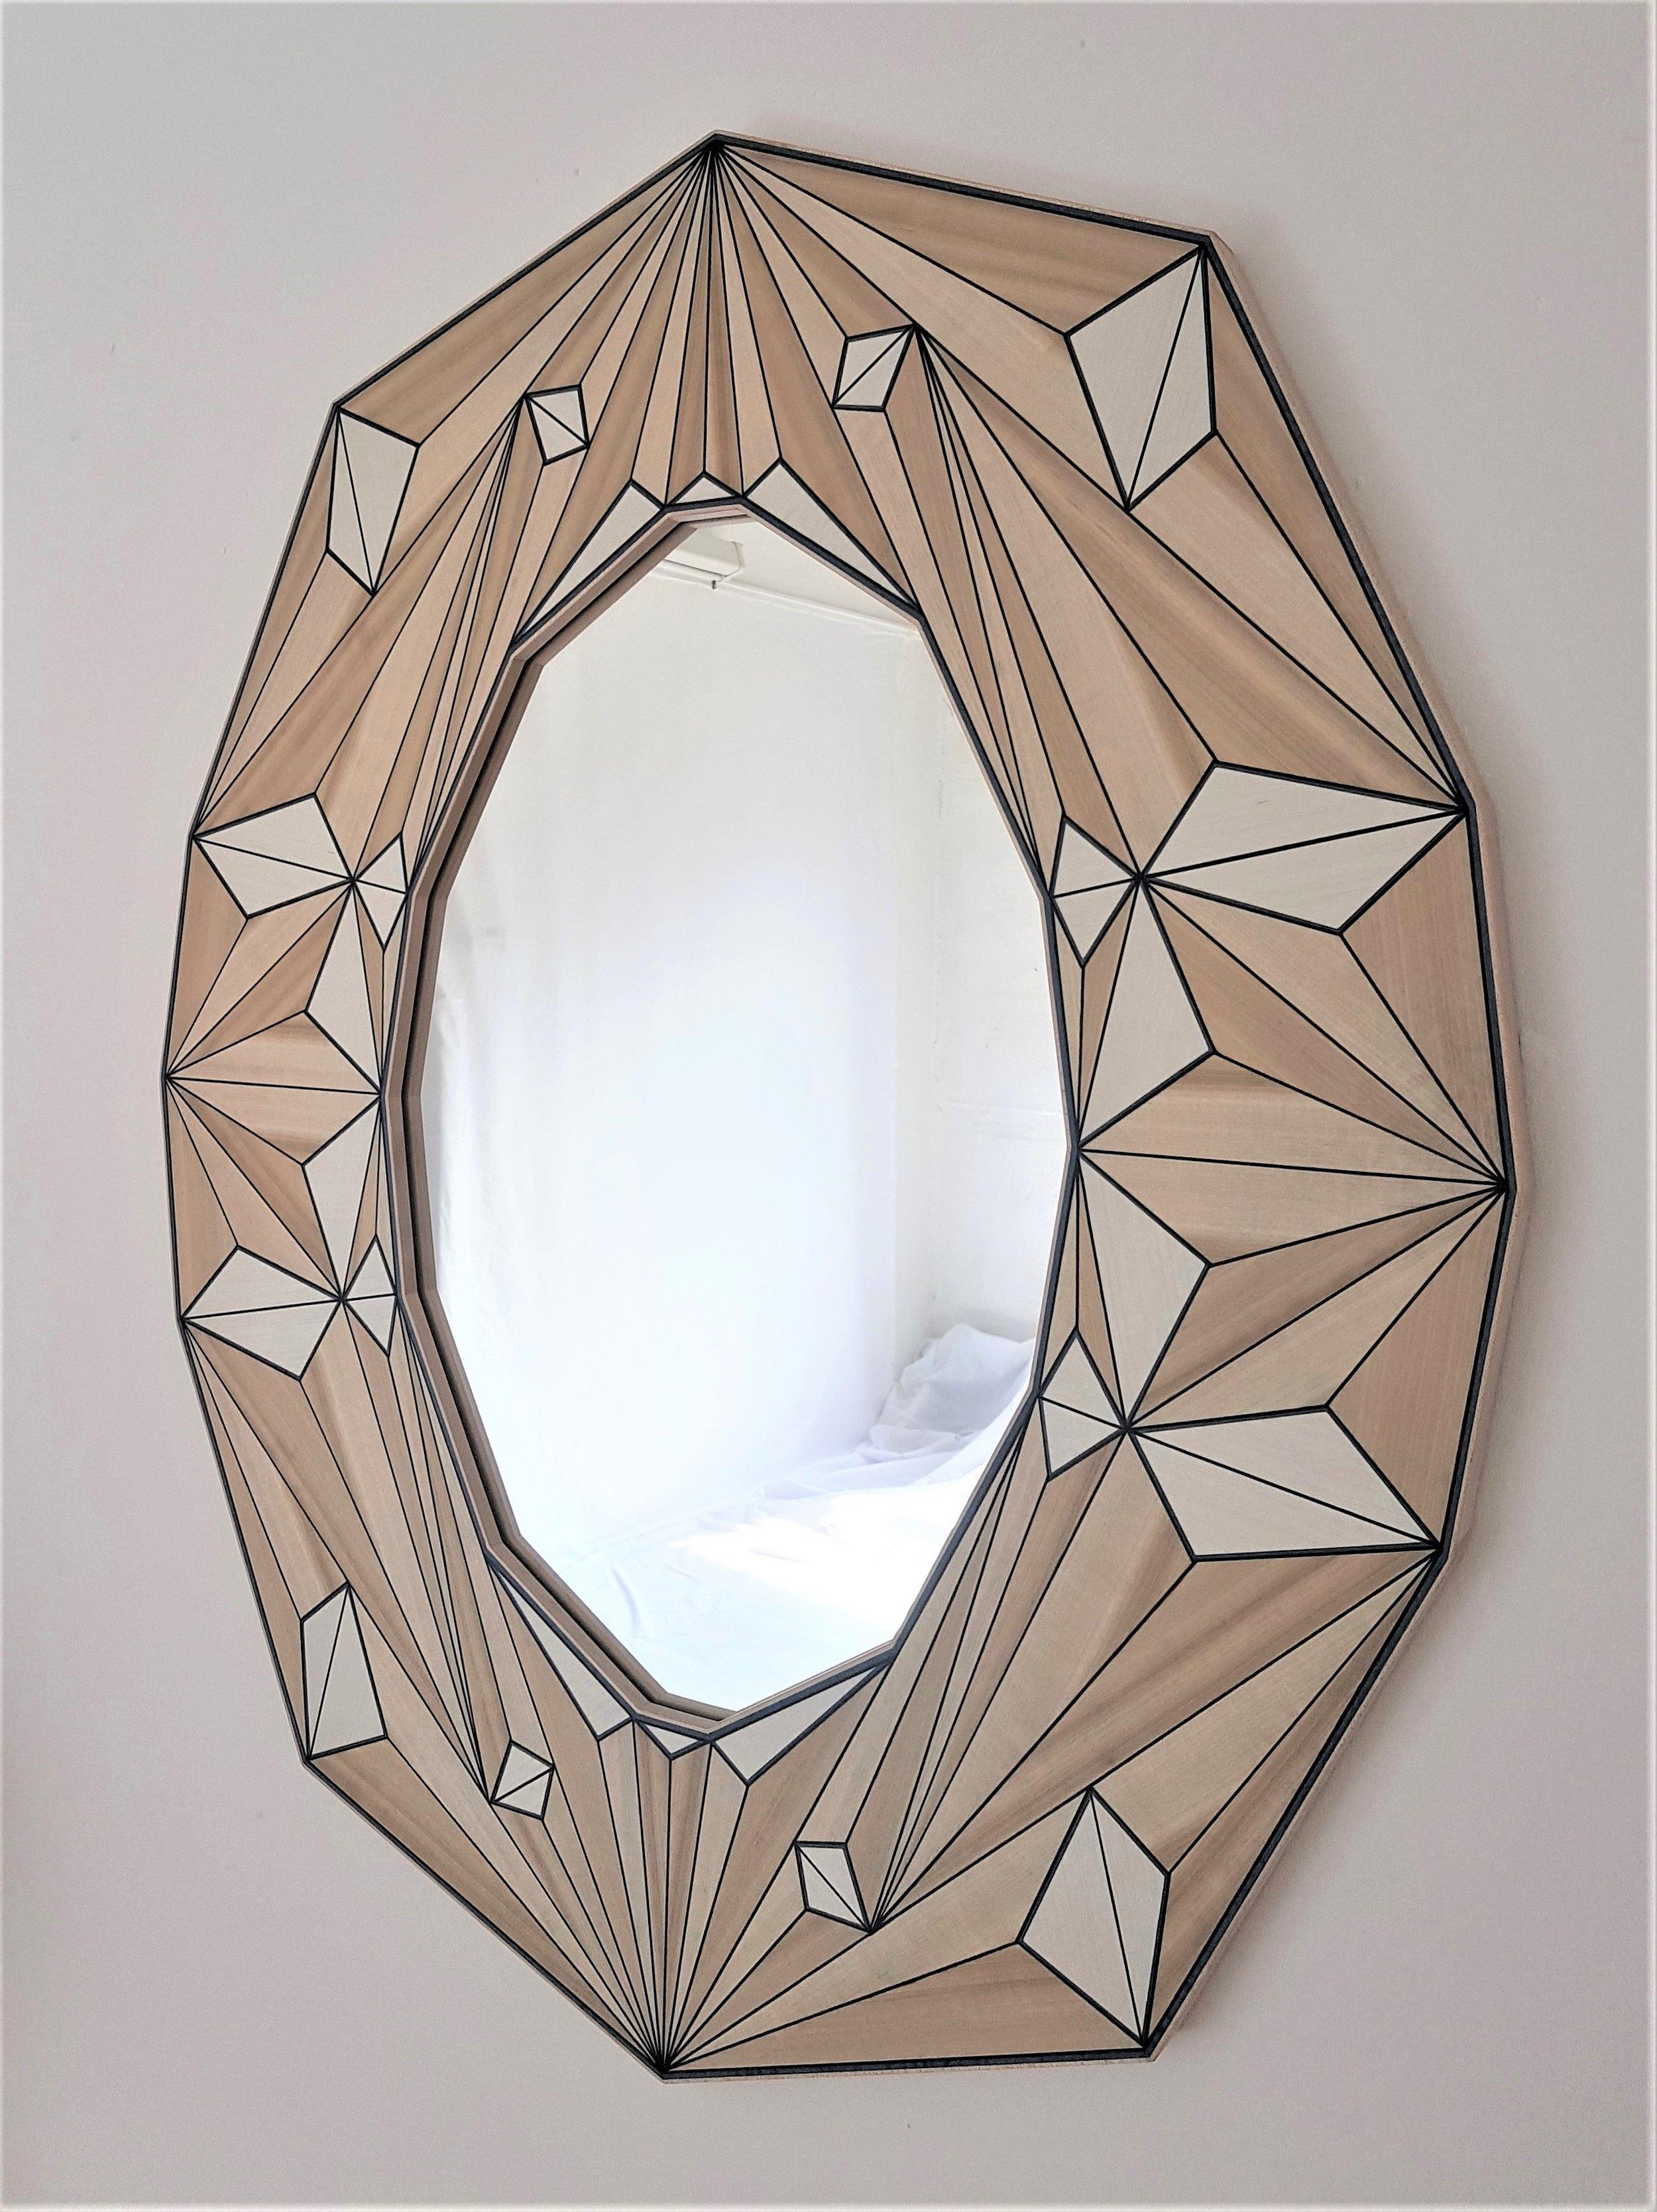 1. Spatial Geometry I - hung vertically -h 1215mm x w 985mm -Christine Meyer-Eaglestone.jpg